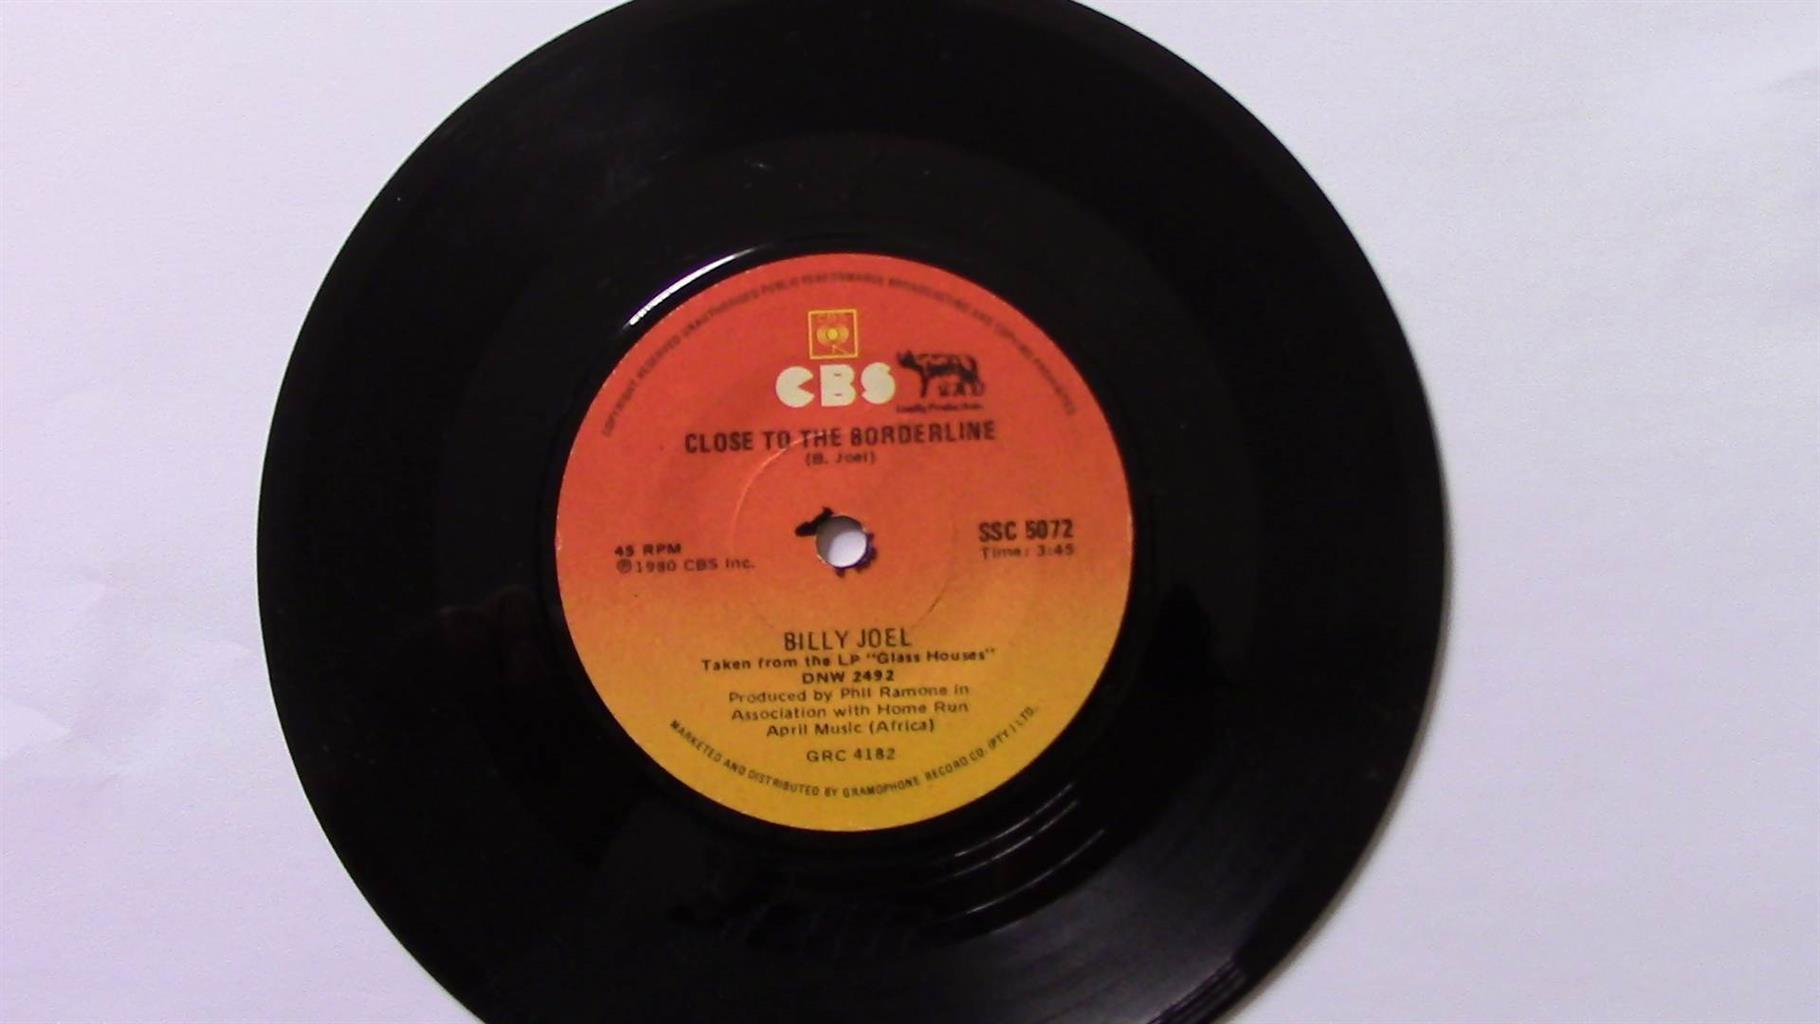 Vinyl Seven Singles (11 - 20)